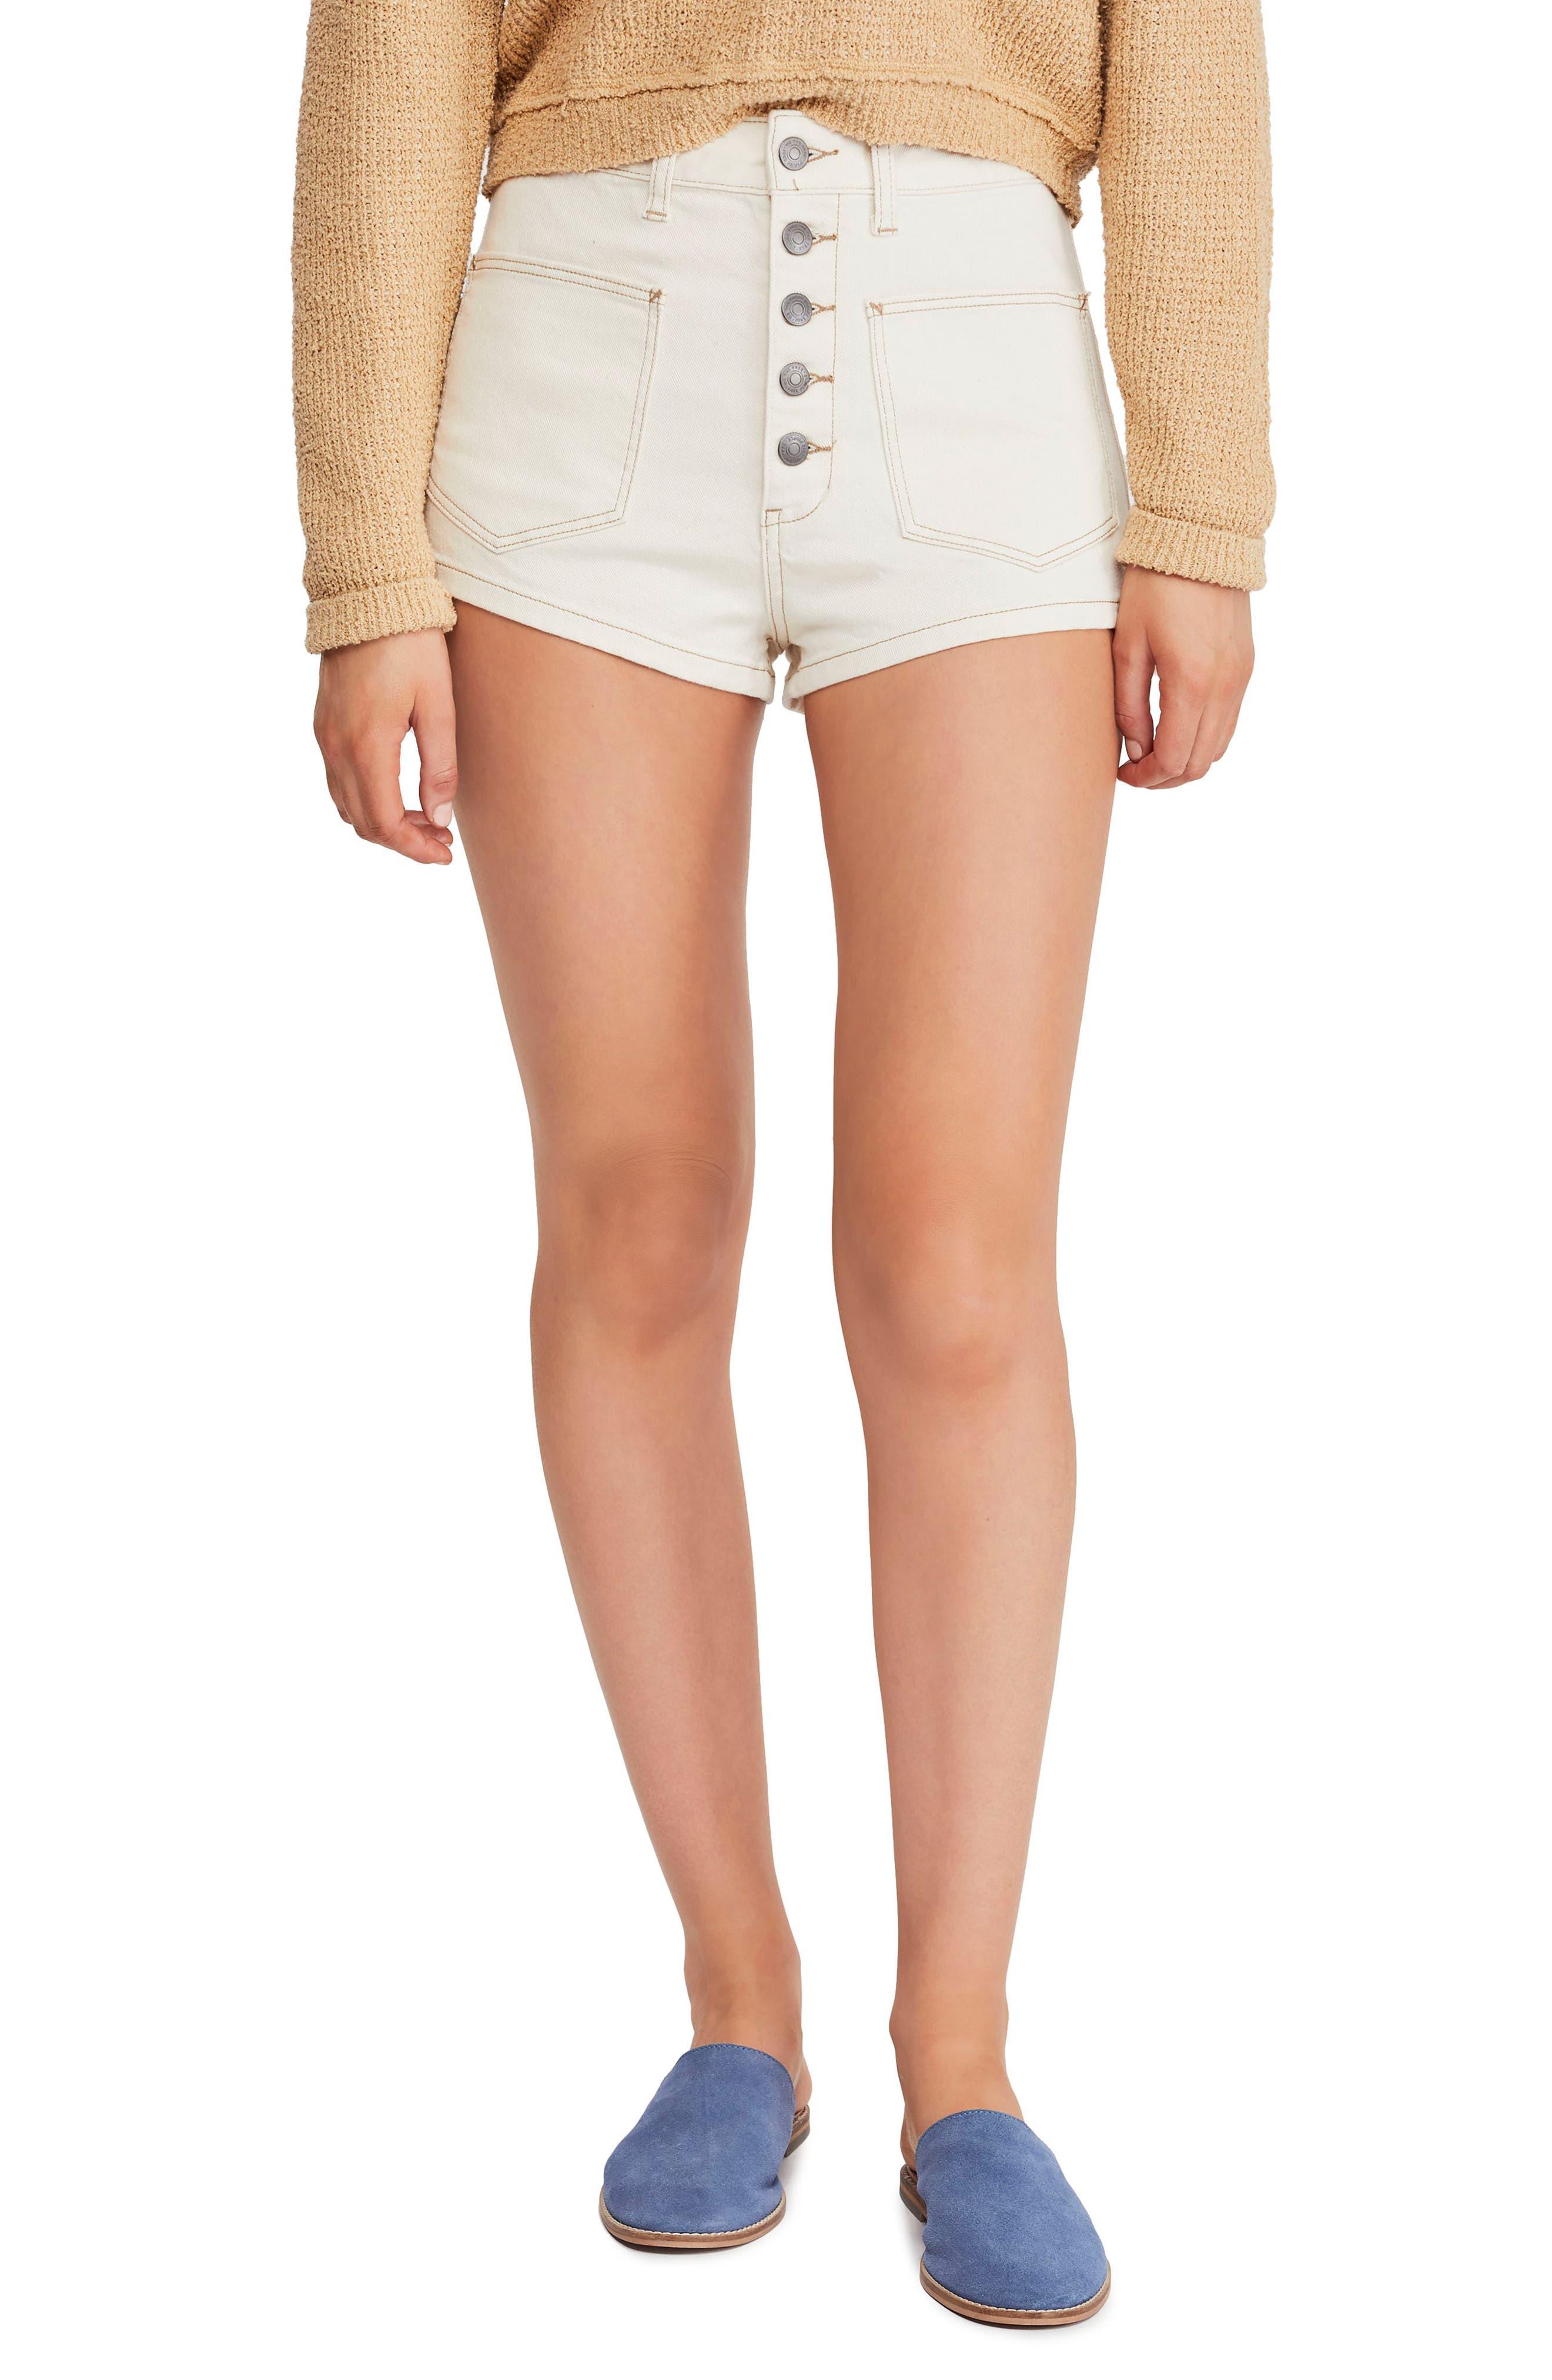 FREE PEOPLE Bridgette Denim Shorts, Main, color, CREAM